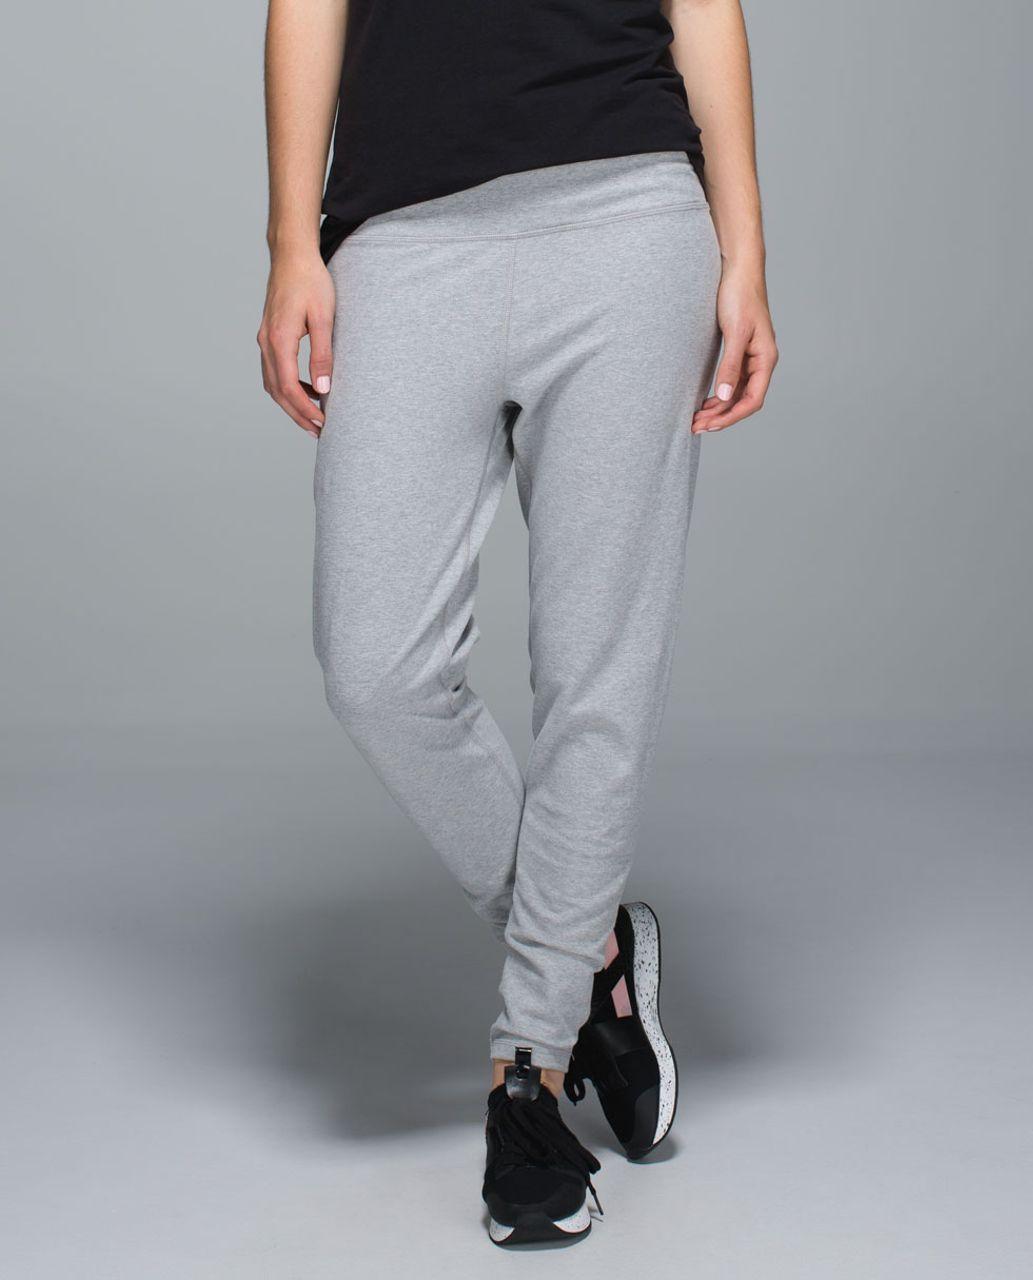 Lululemon Atman Pant - Heathered Medium Grey